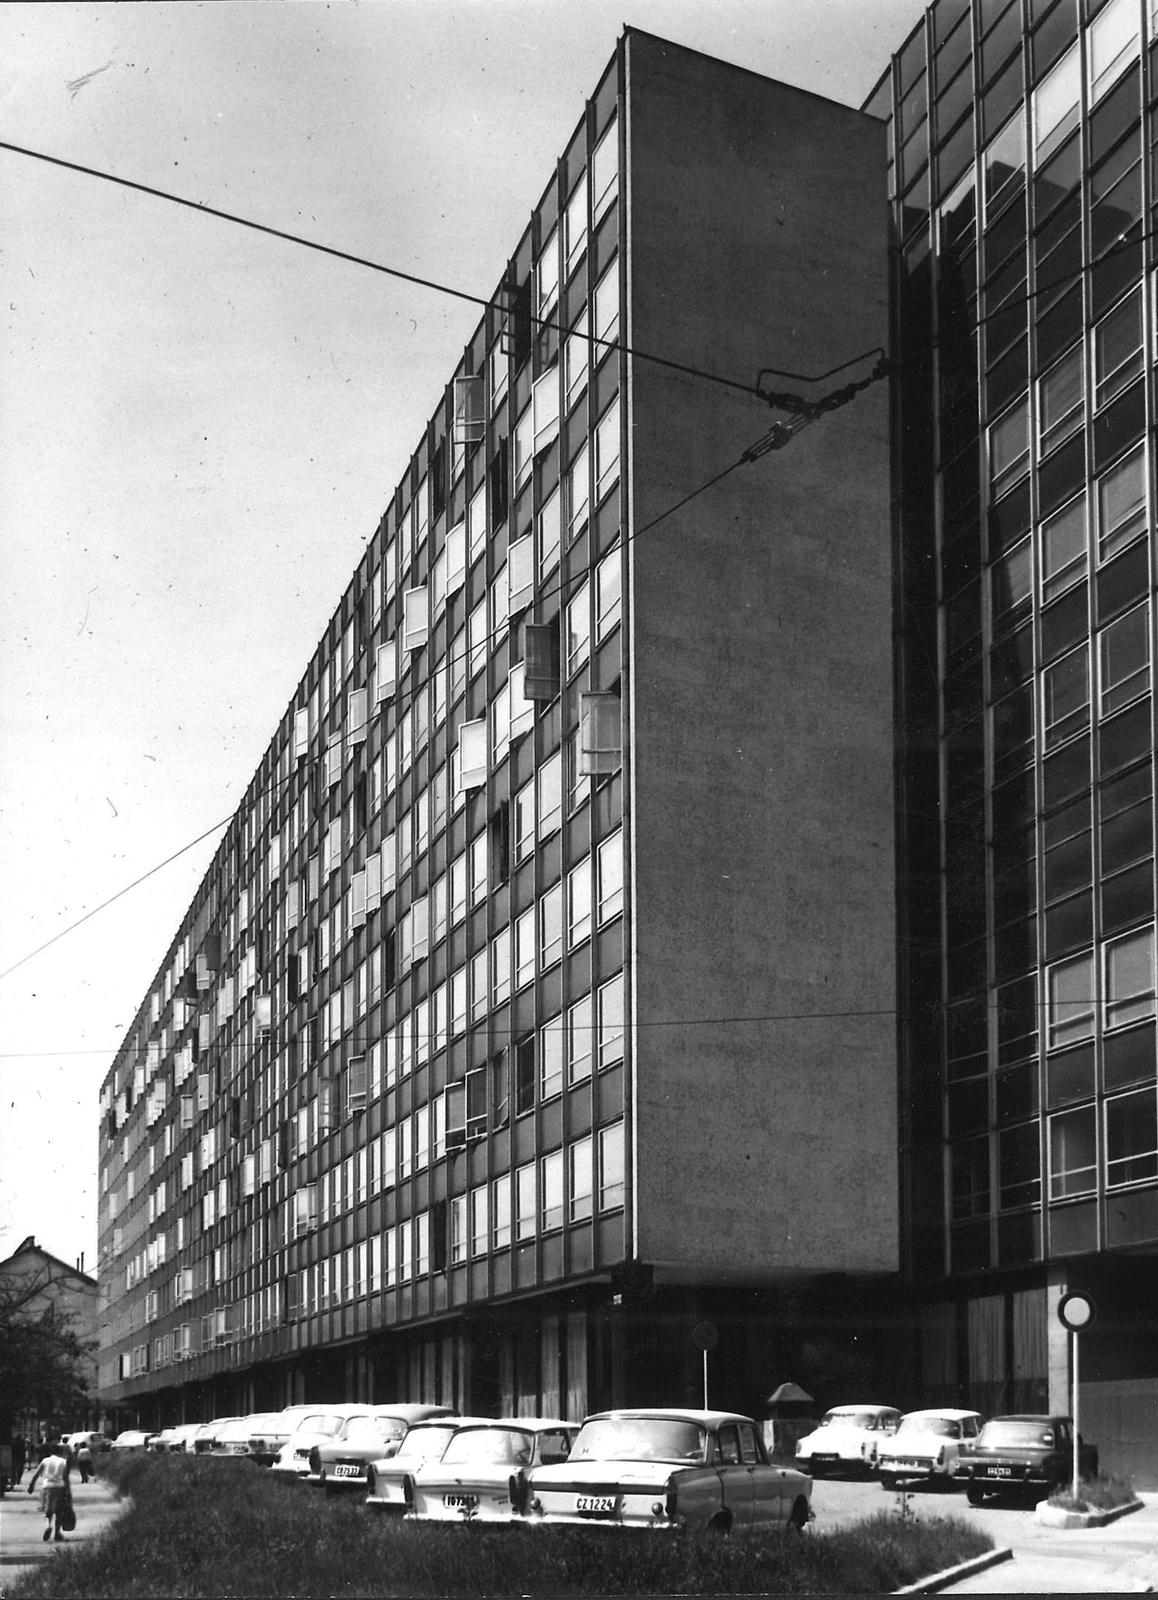 fovarosi.blog.hu: GazdasagiMiniszterium-MargitKrt-1970esEvek-11 - indafoto.hu